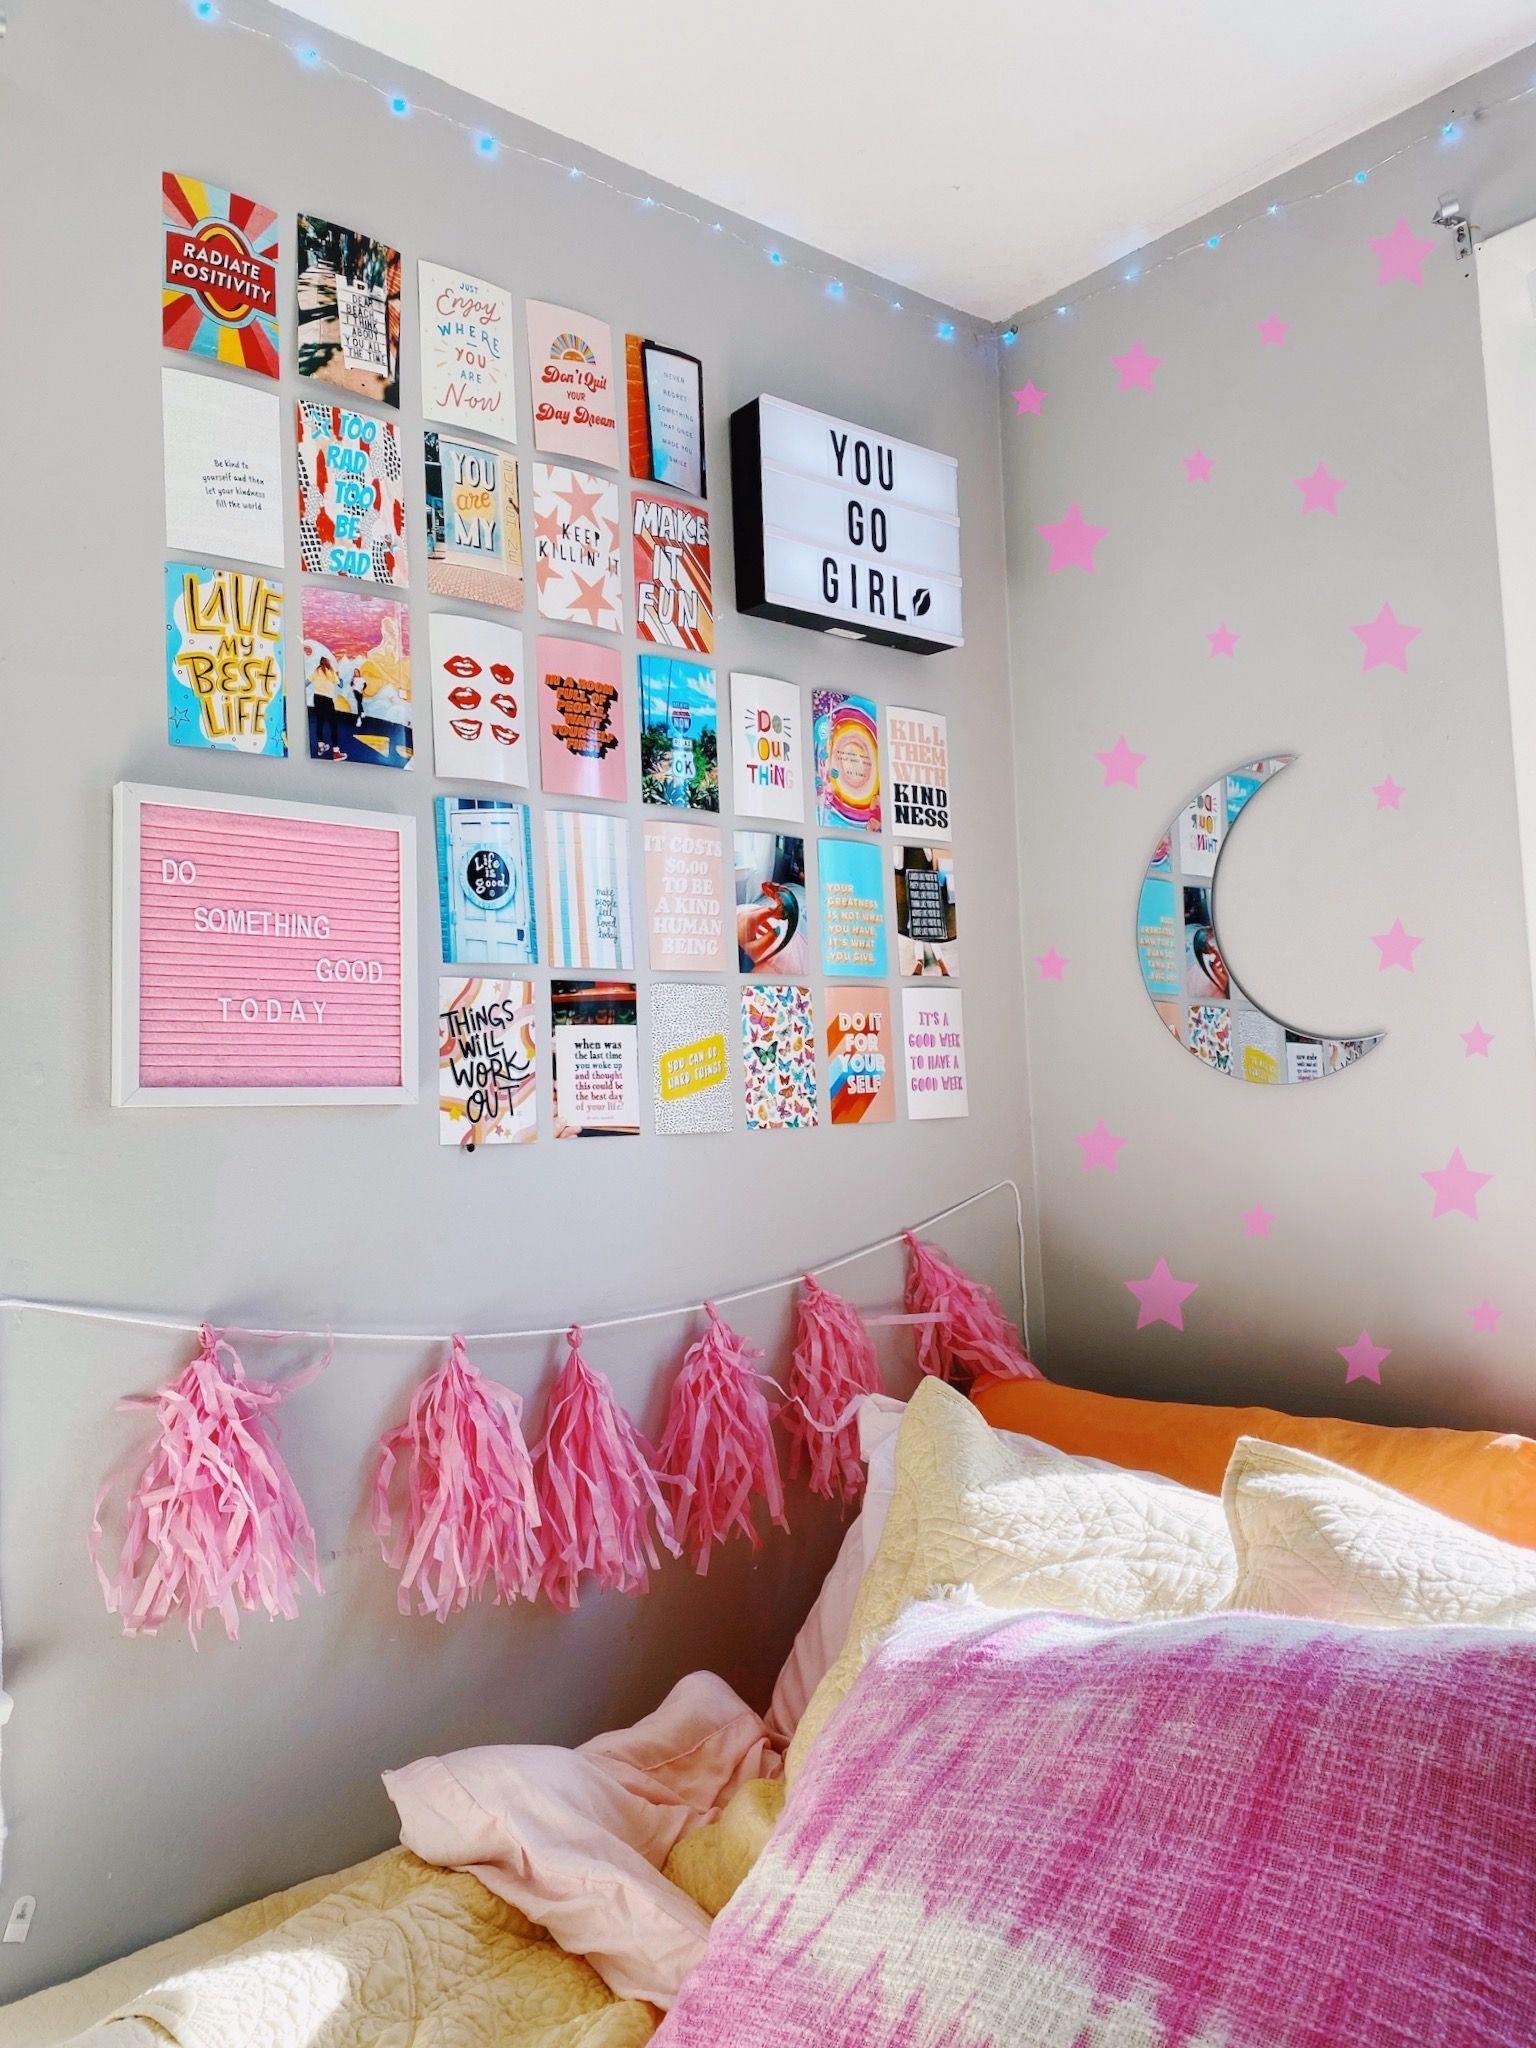 Caitysprints On Etsy Bedroom Vsco Roomgoals Dorm Dormroom